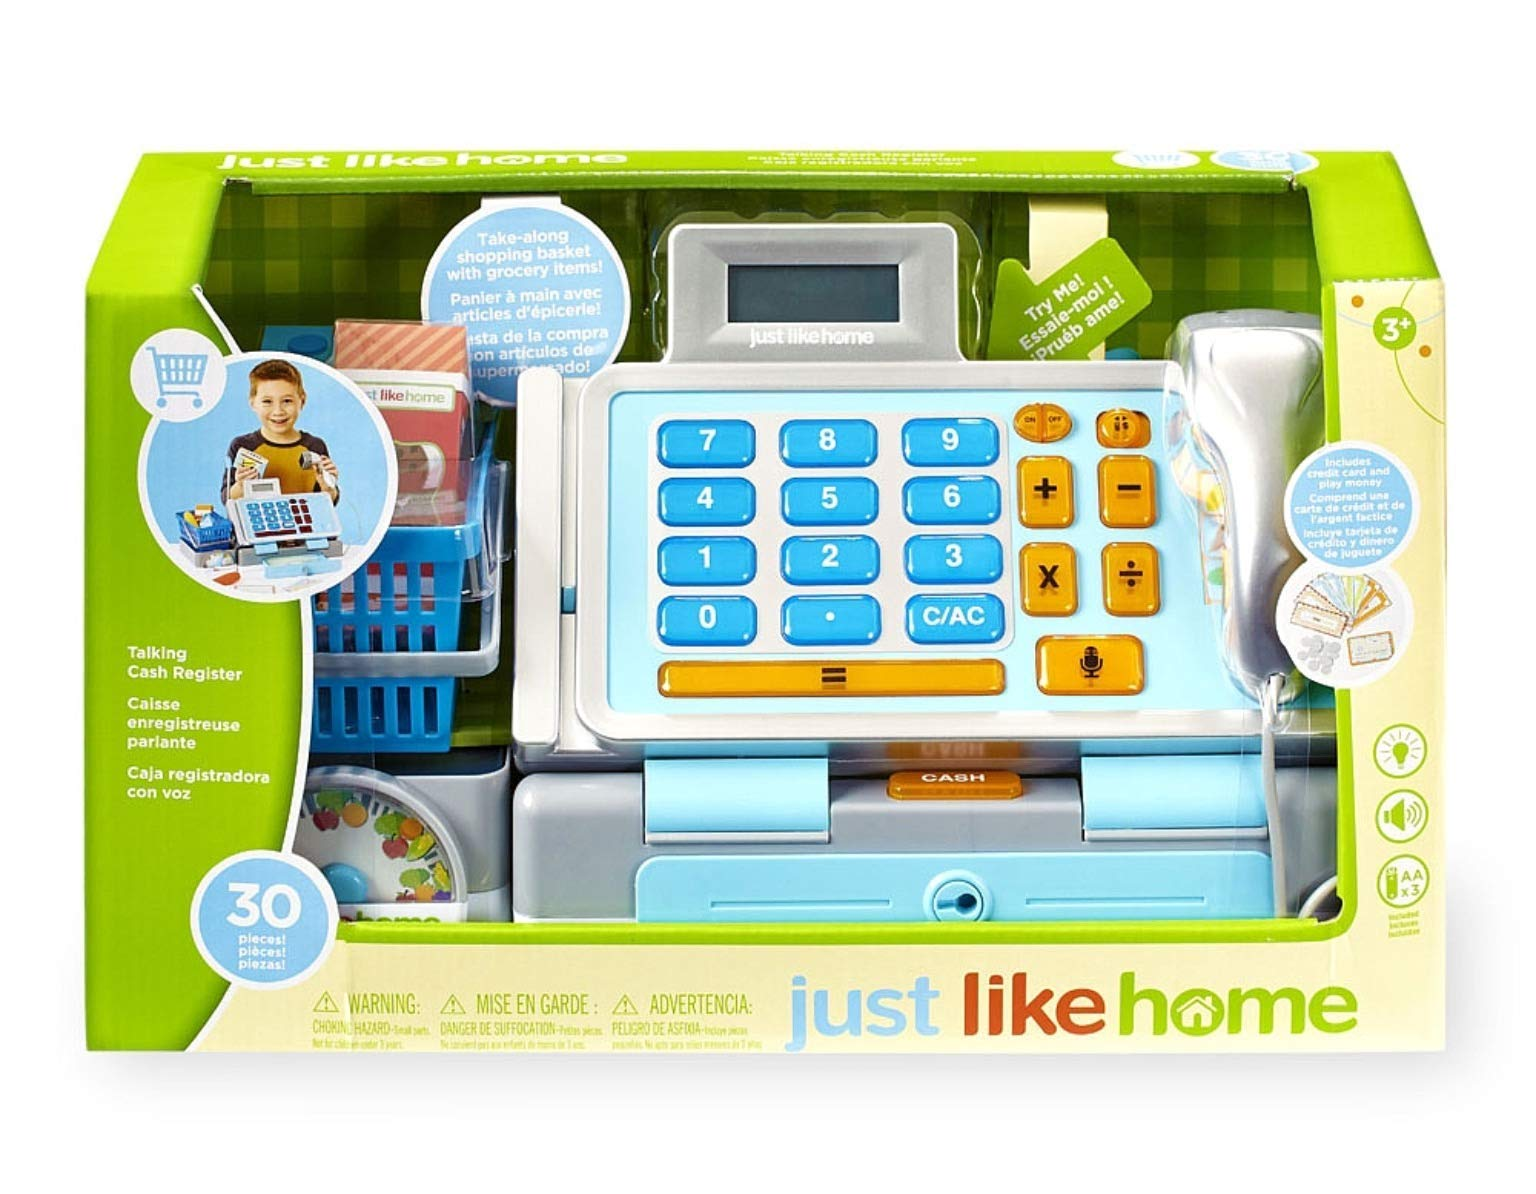 Toys R Us Just Like Home Talking Cash Register - Blue